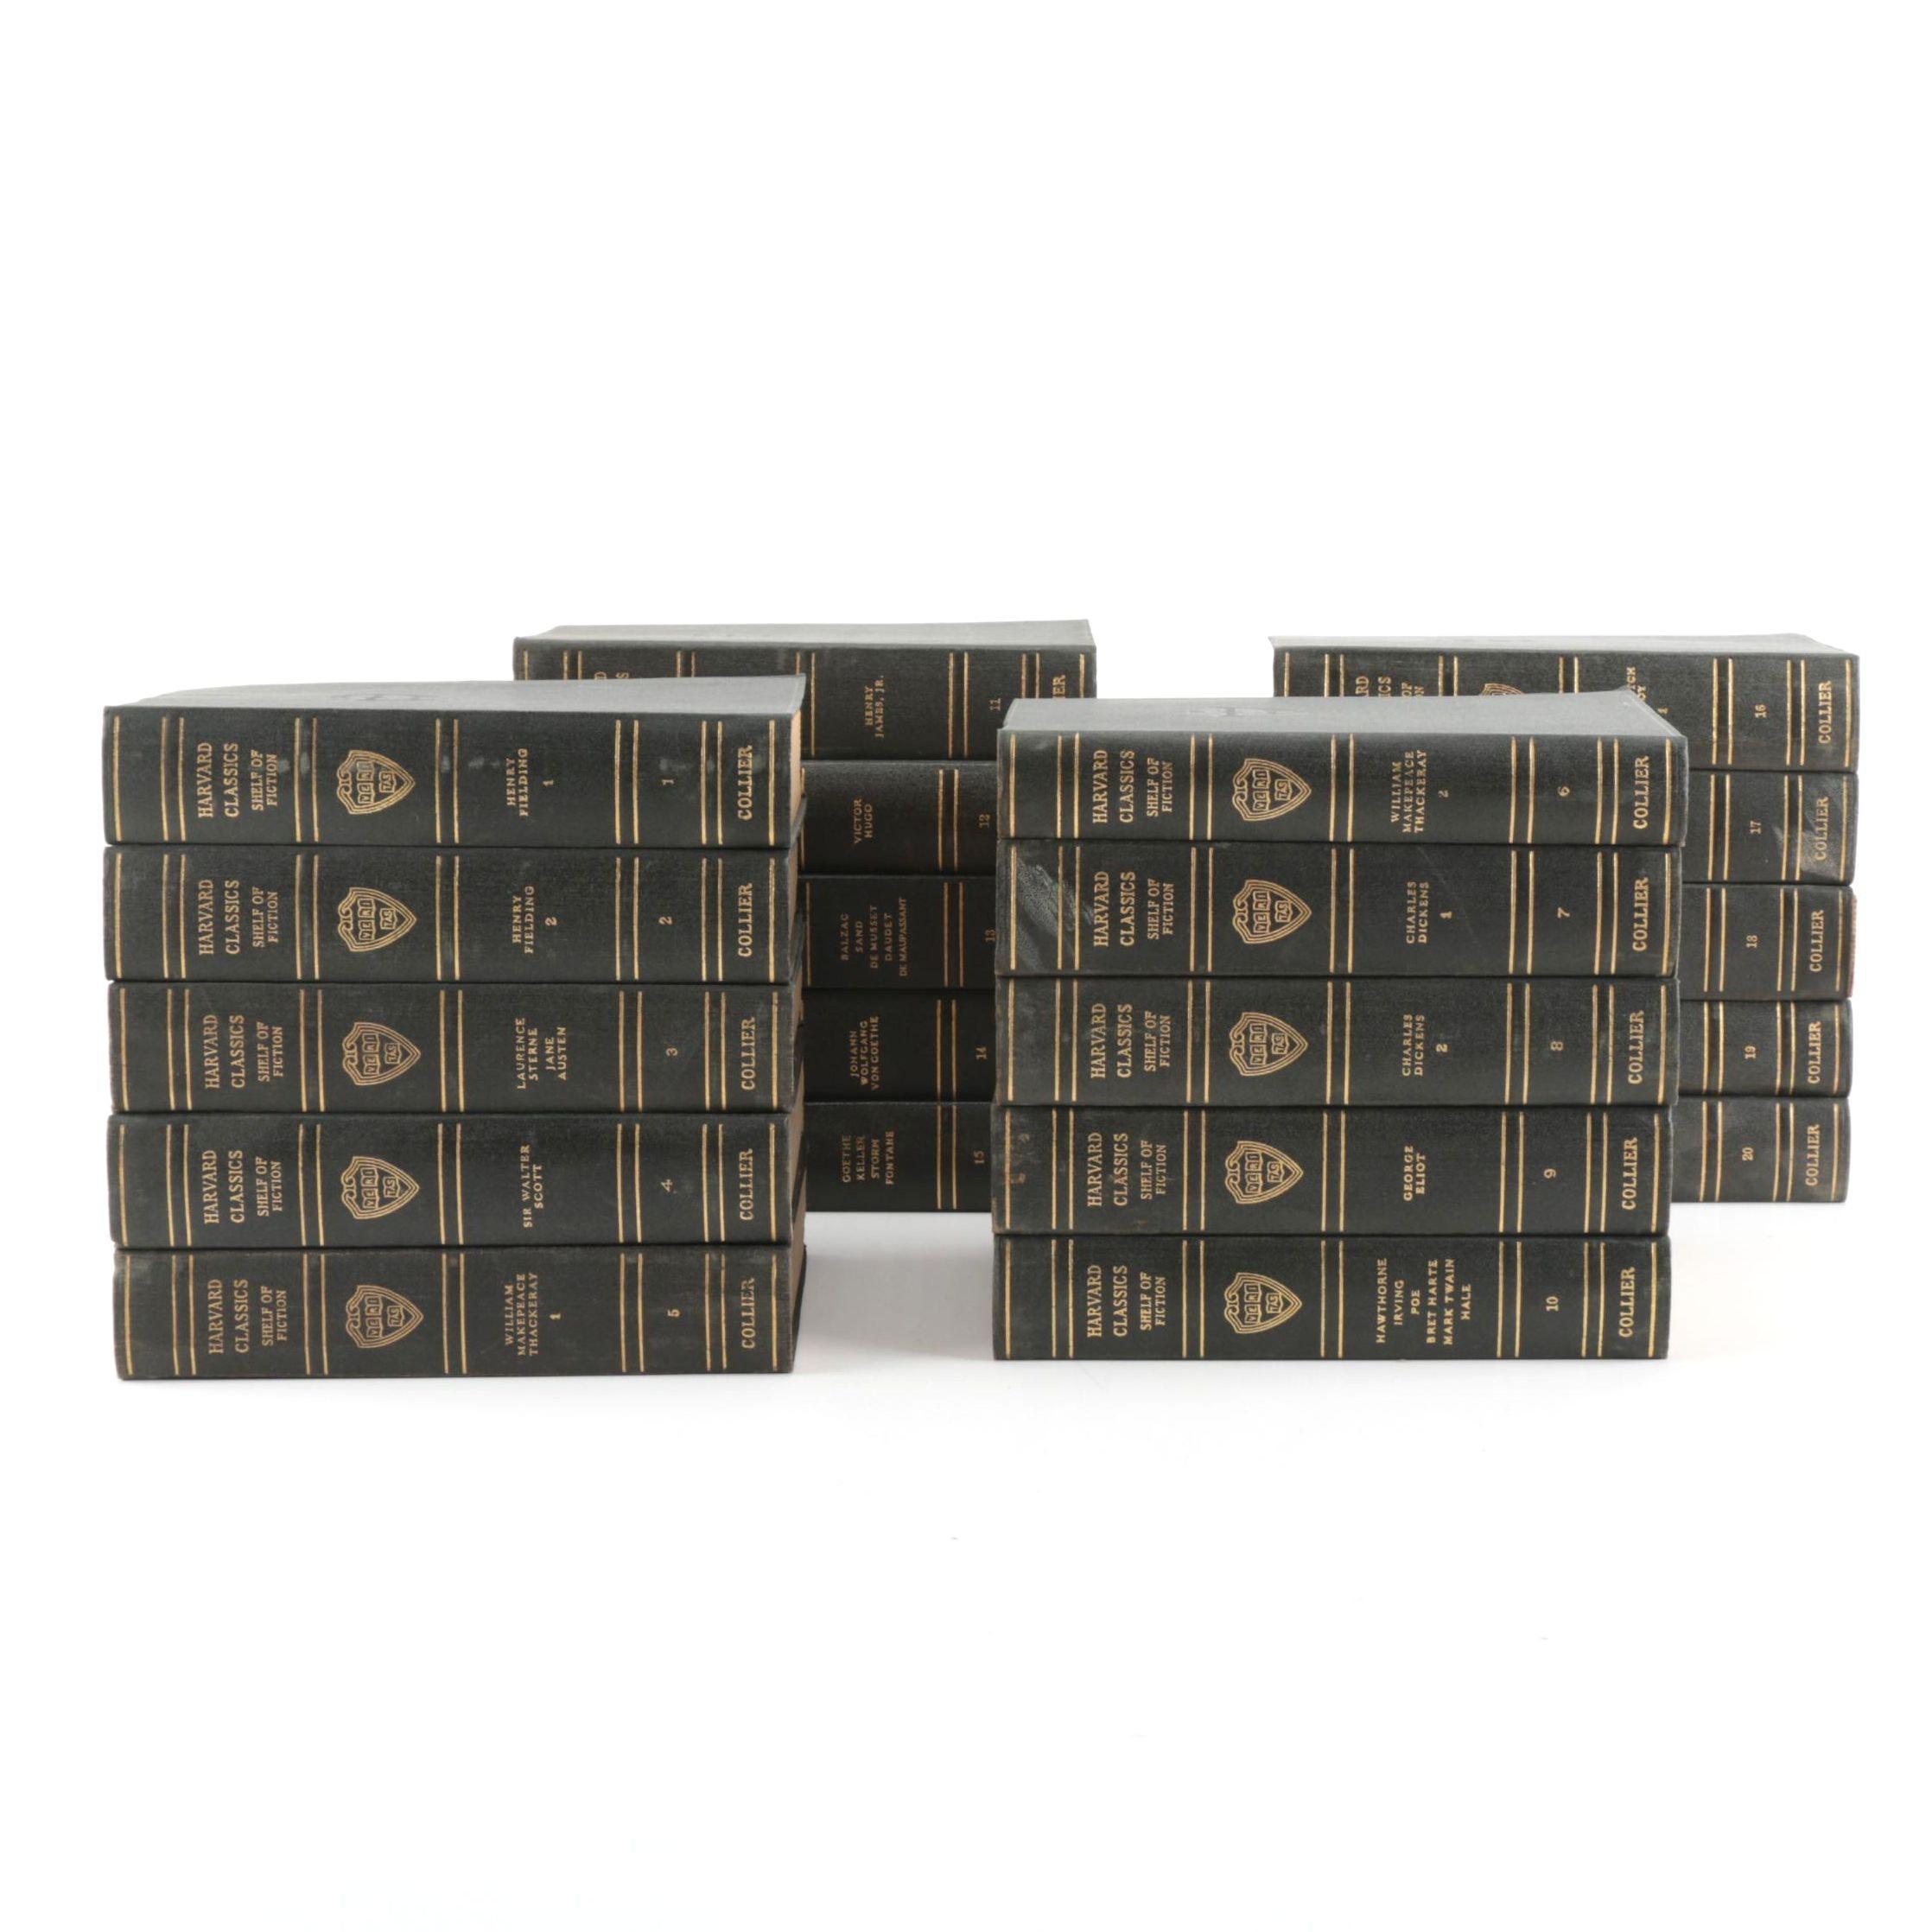 "20 Volume Set of Harvard Classics ""Shelf of Fiction"""